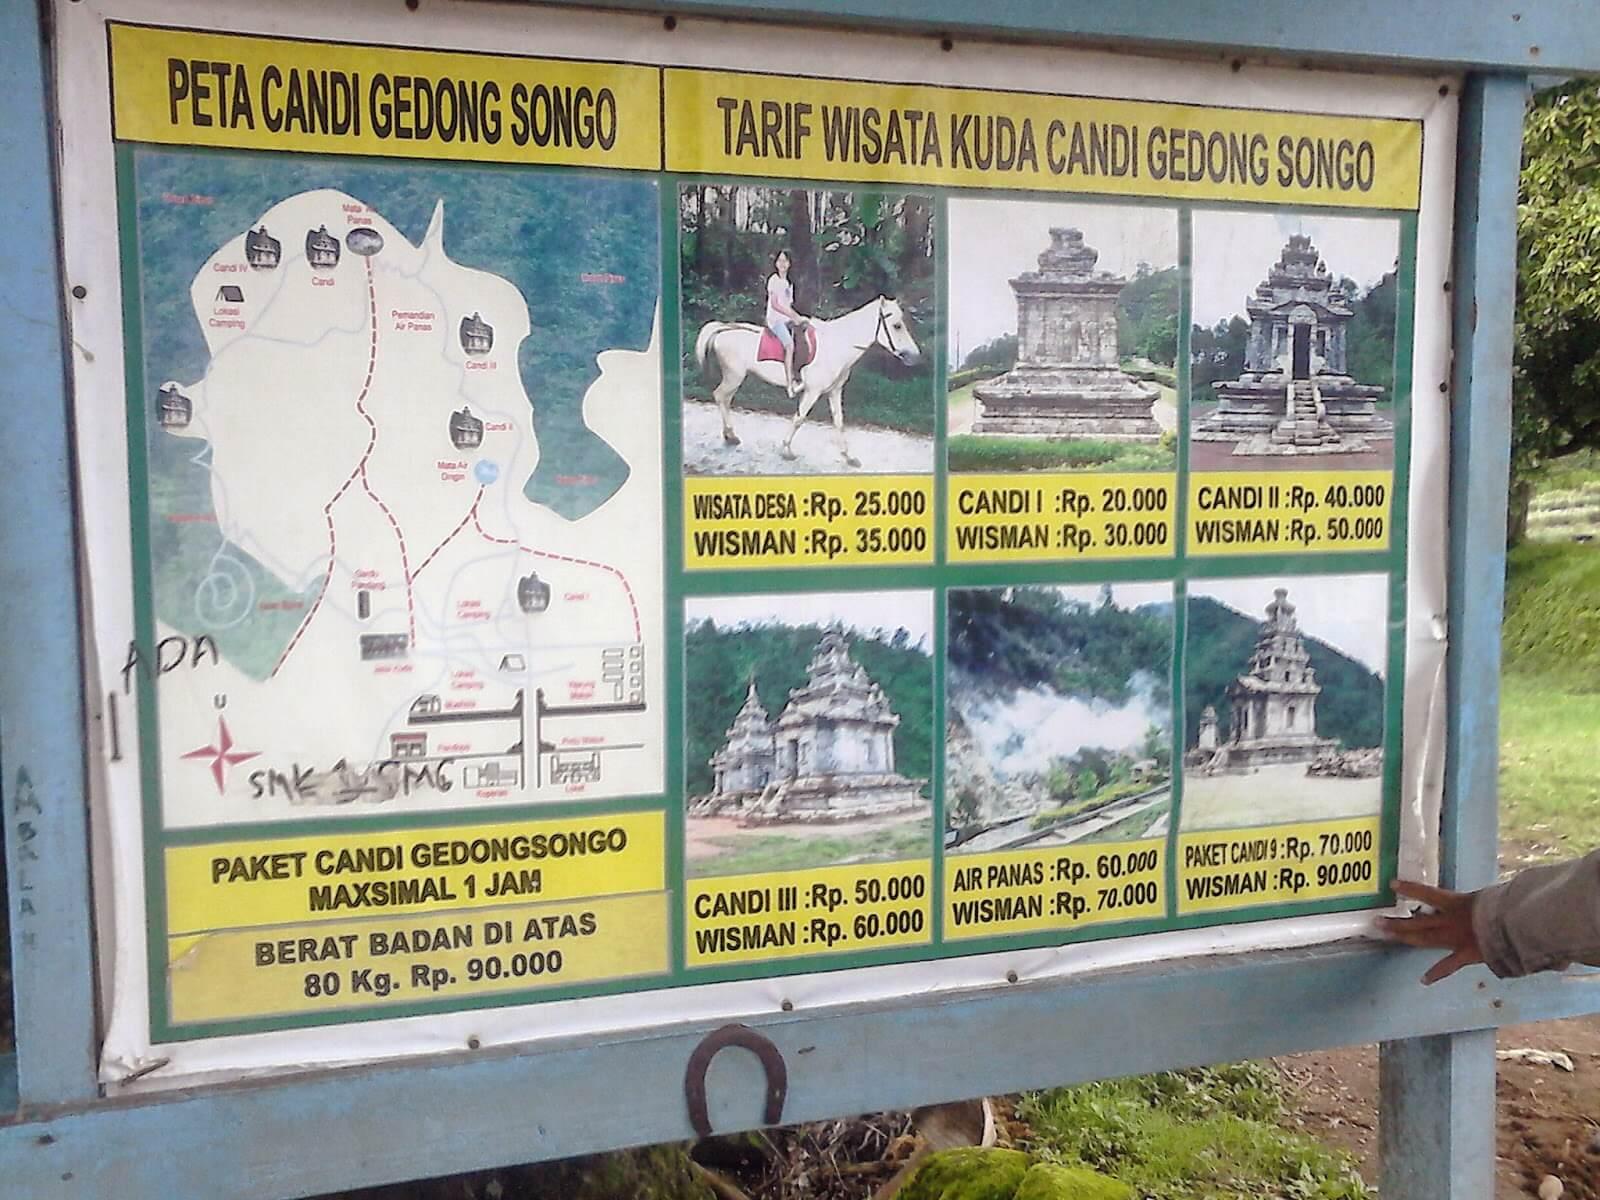 Obyek Wisata Candi Gedong Songo Semarang Paket Kuda Jungle Toon